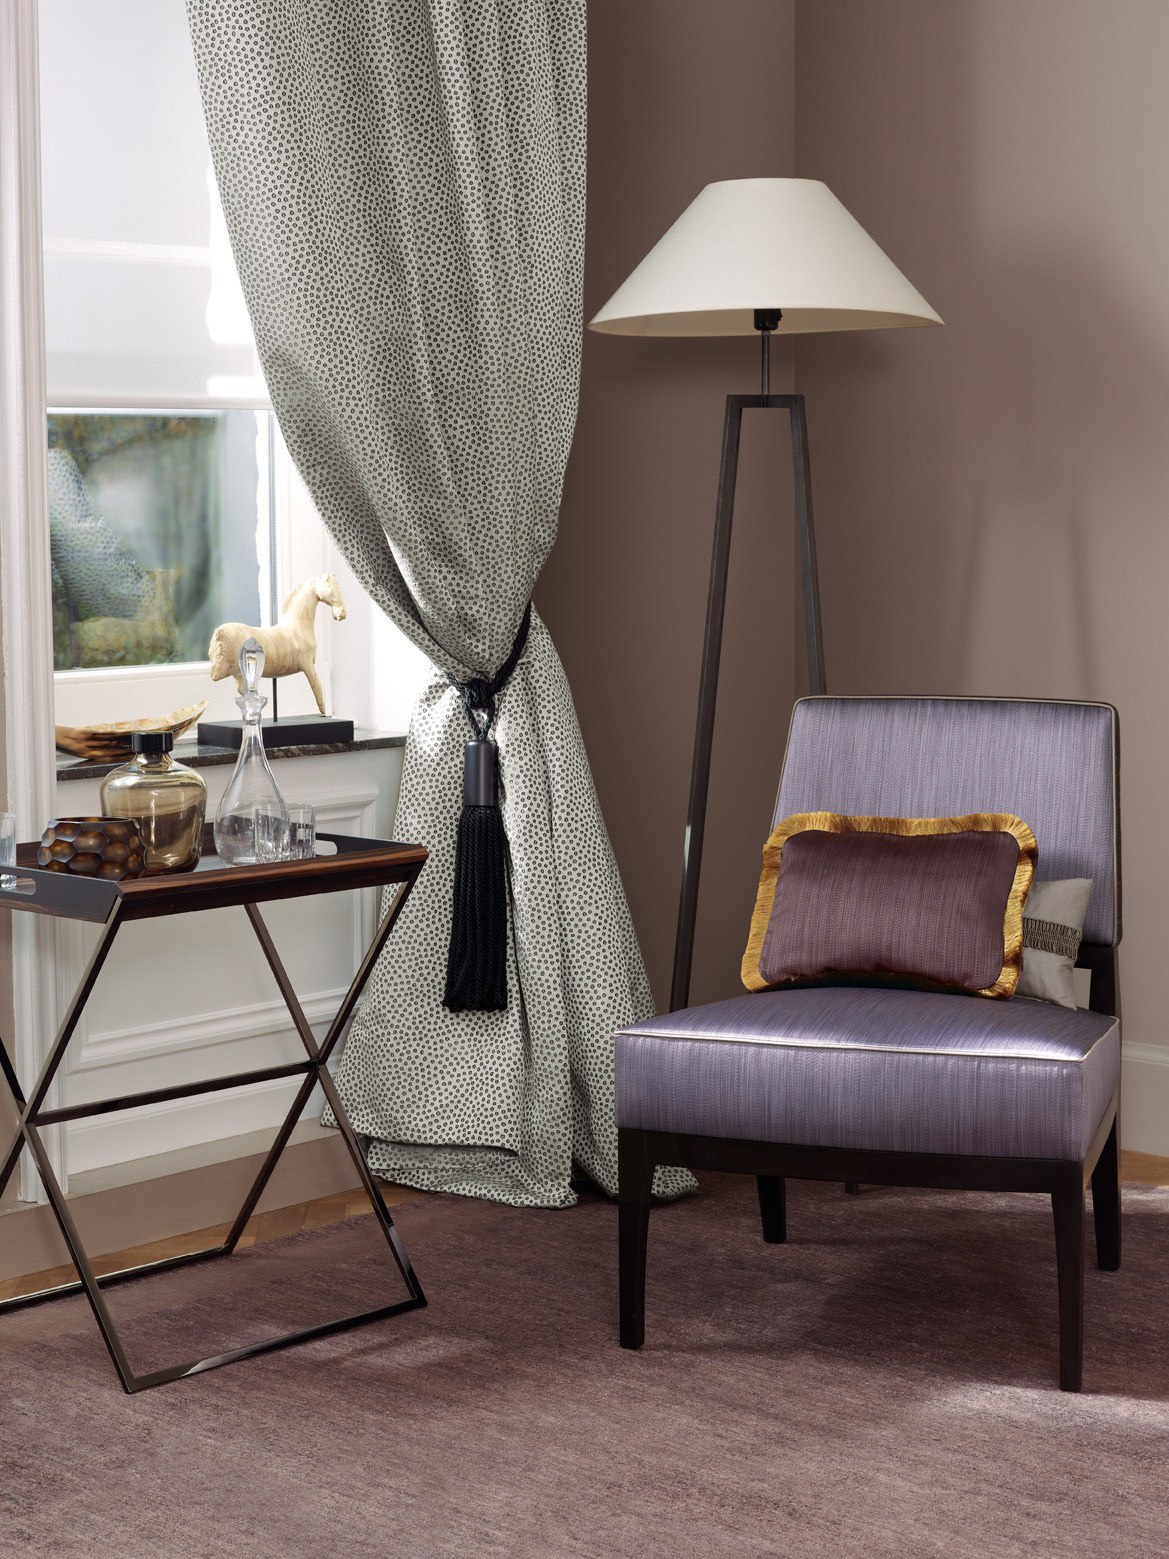 uni stoff f r gardinen glint kollektion urban jungle by zimmer rohde. Black Bedroom Furniture Sets. Home Design Ideas